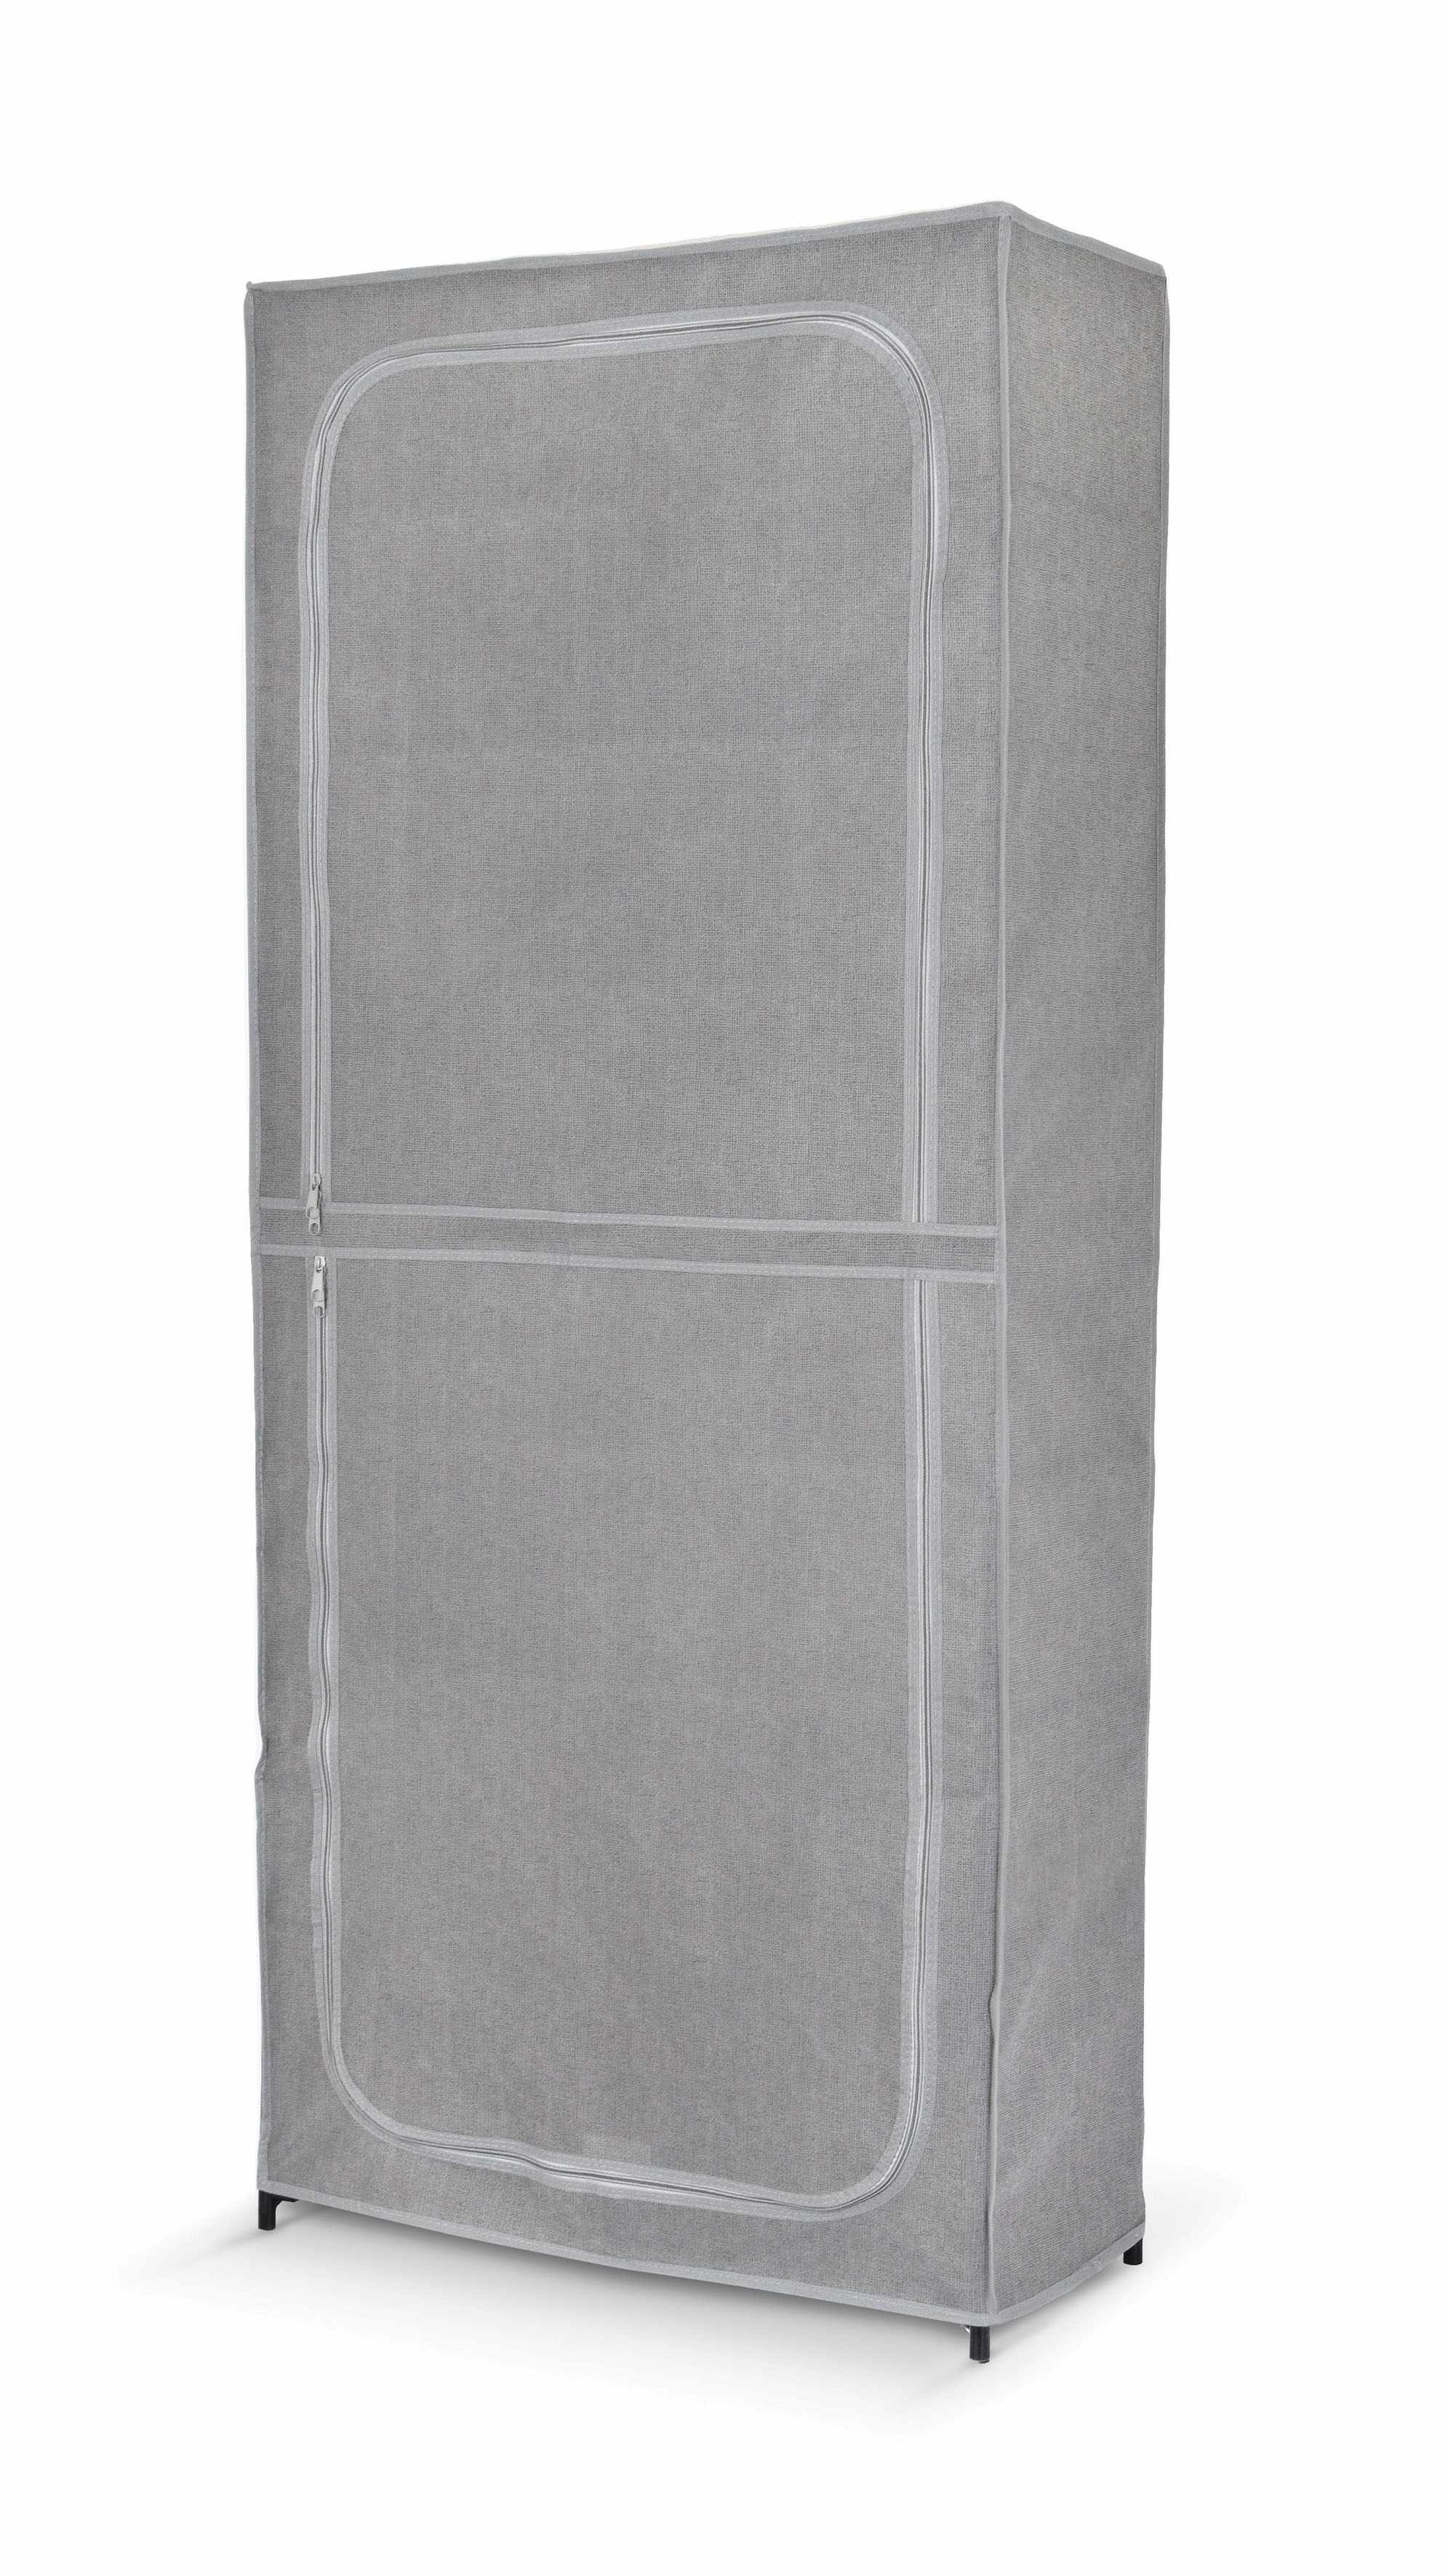 Suport textil pentru incaltaminte, 7 rafturi, Clara II Gri, l68xA30xH160 cm la pret 153 lei